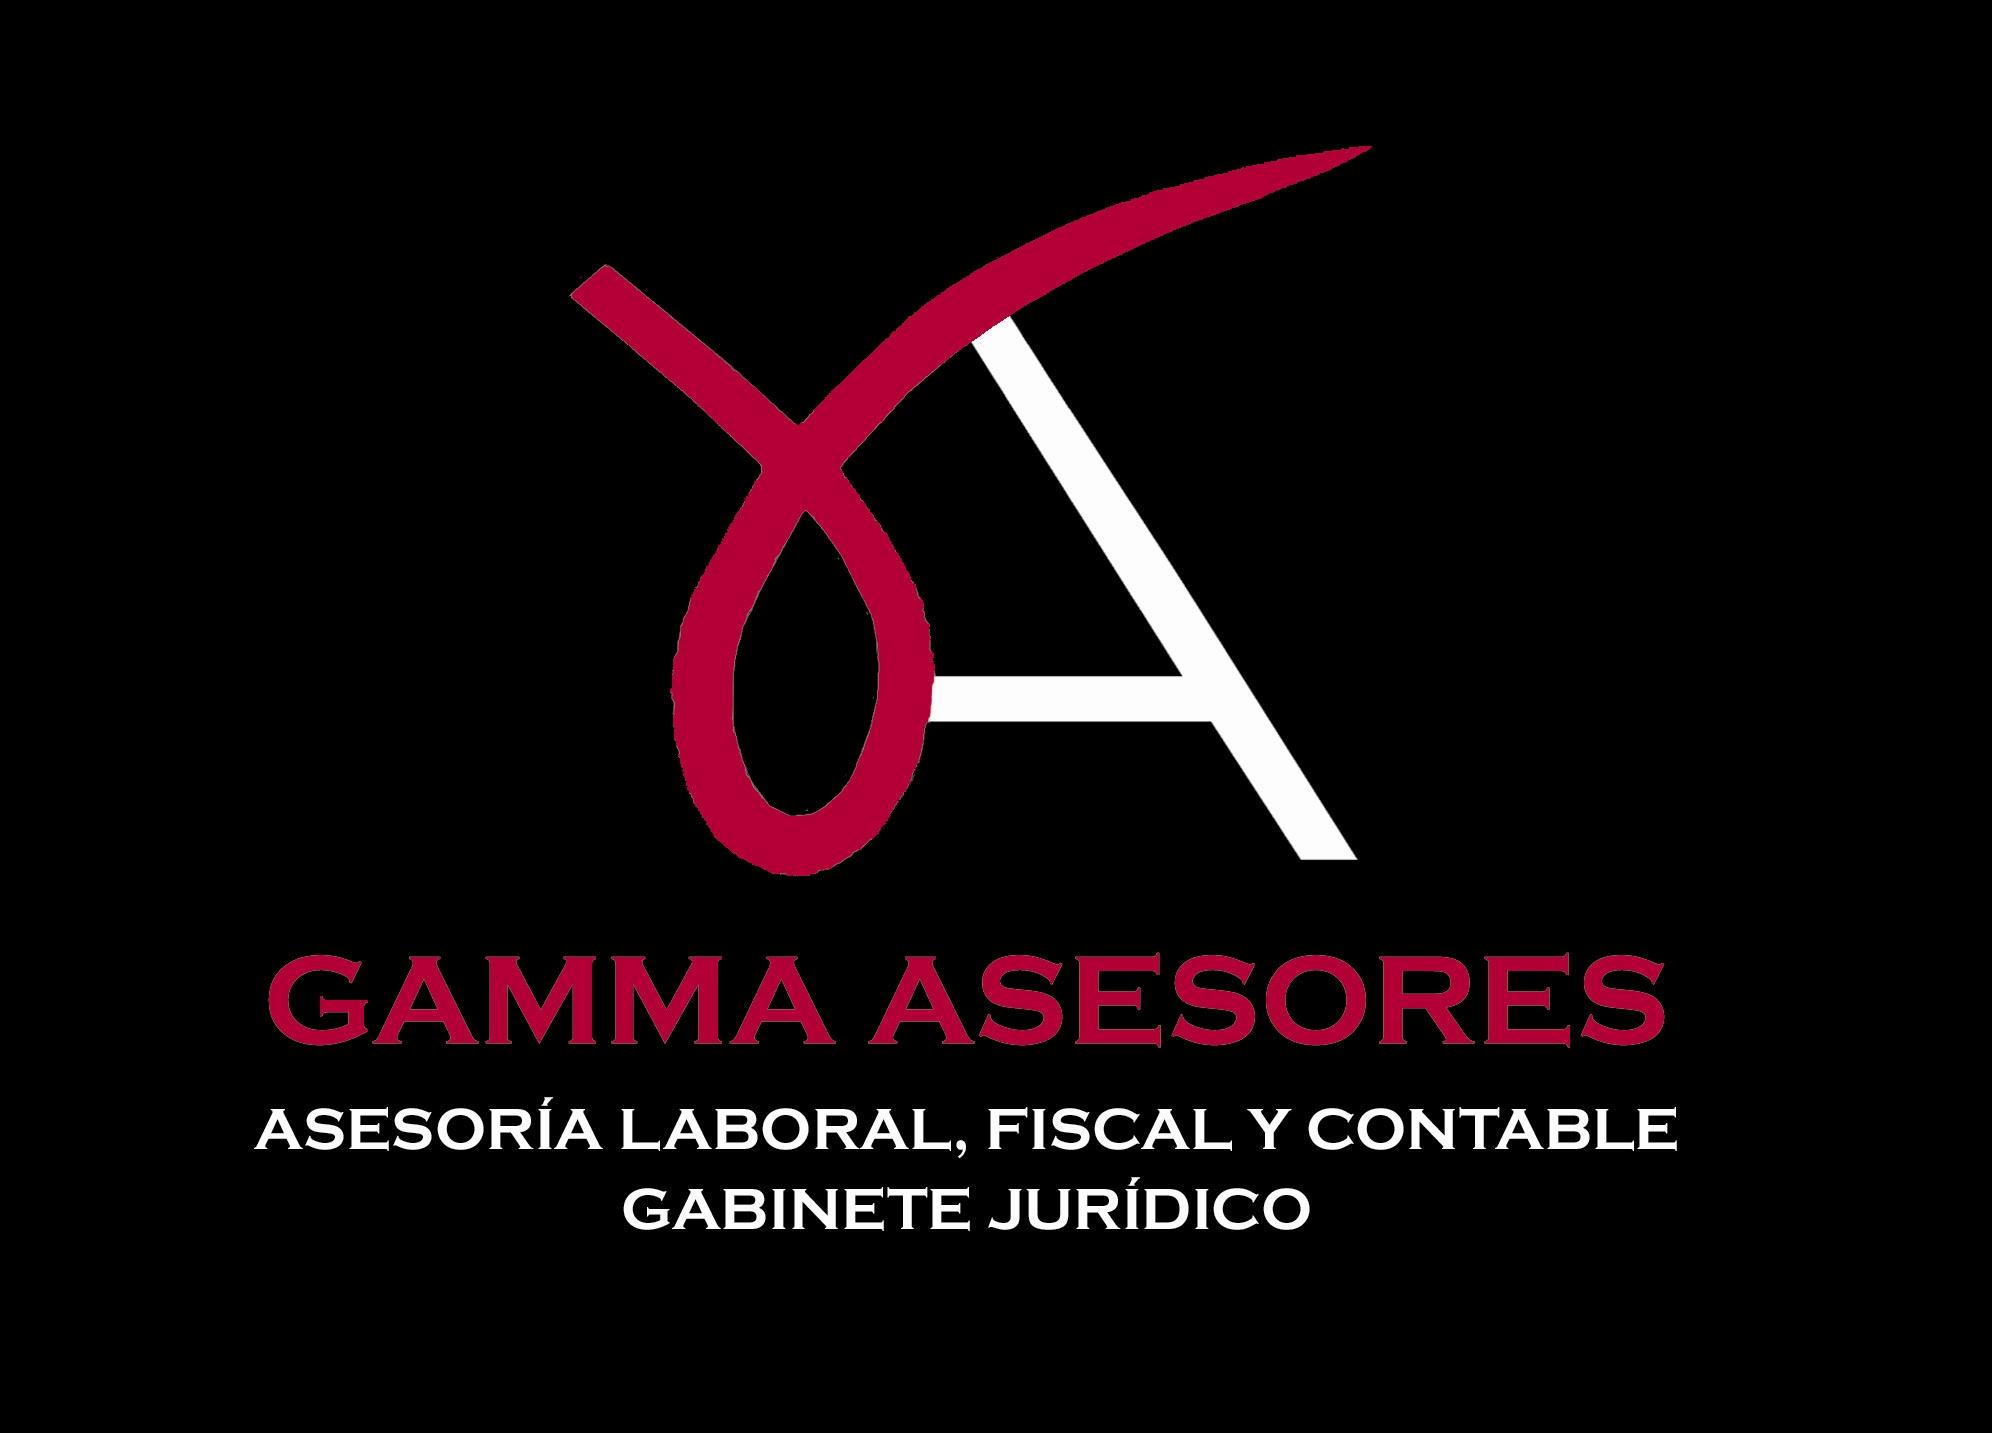 Gamma Asesores